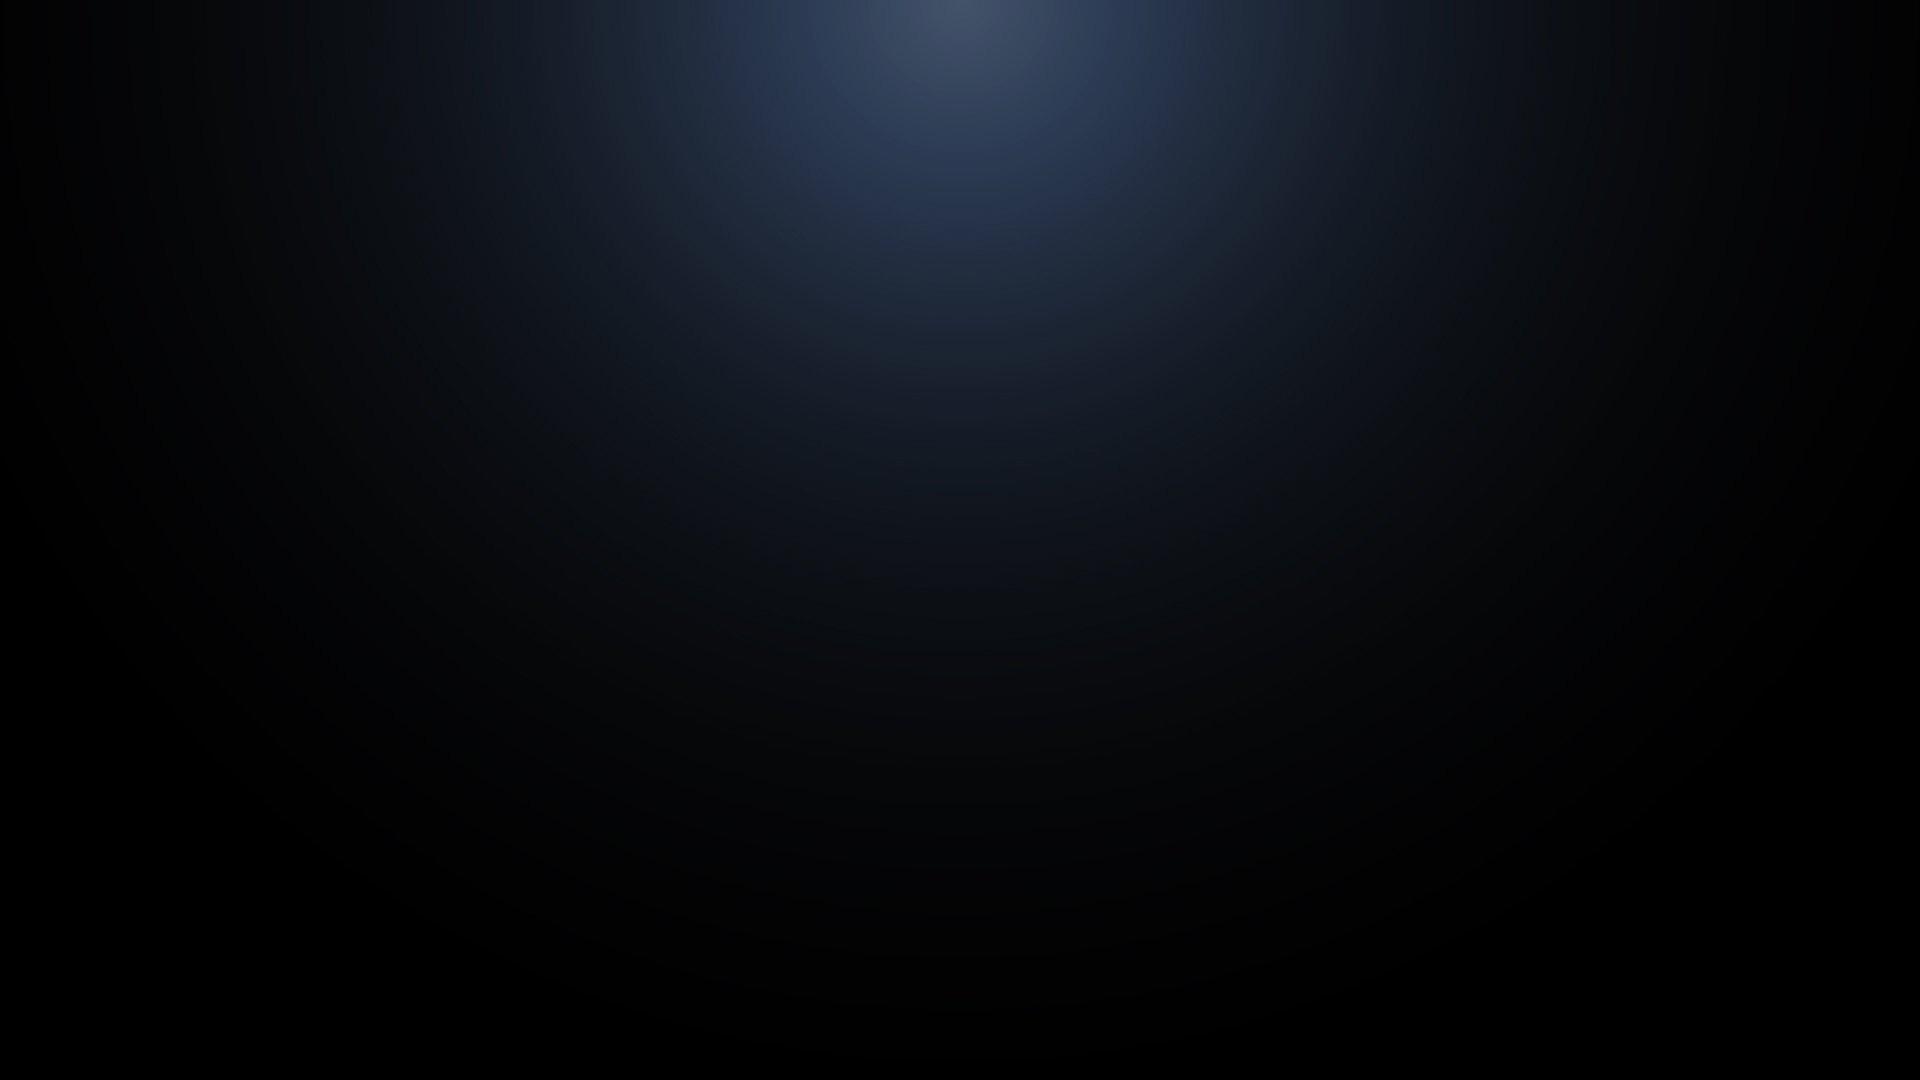 background black darkblue light textures texture download wallpapers  widescreen download wallpapers background hd